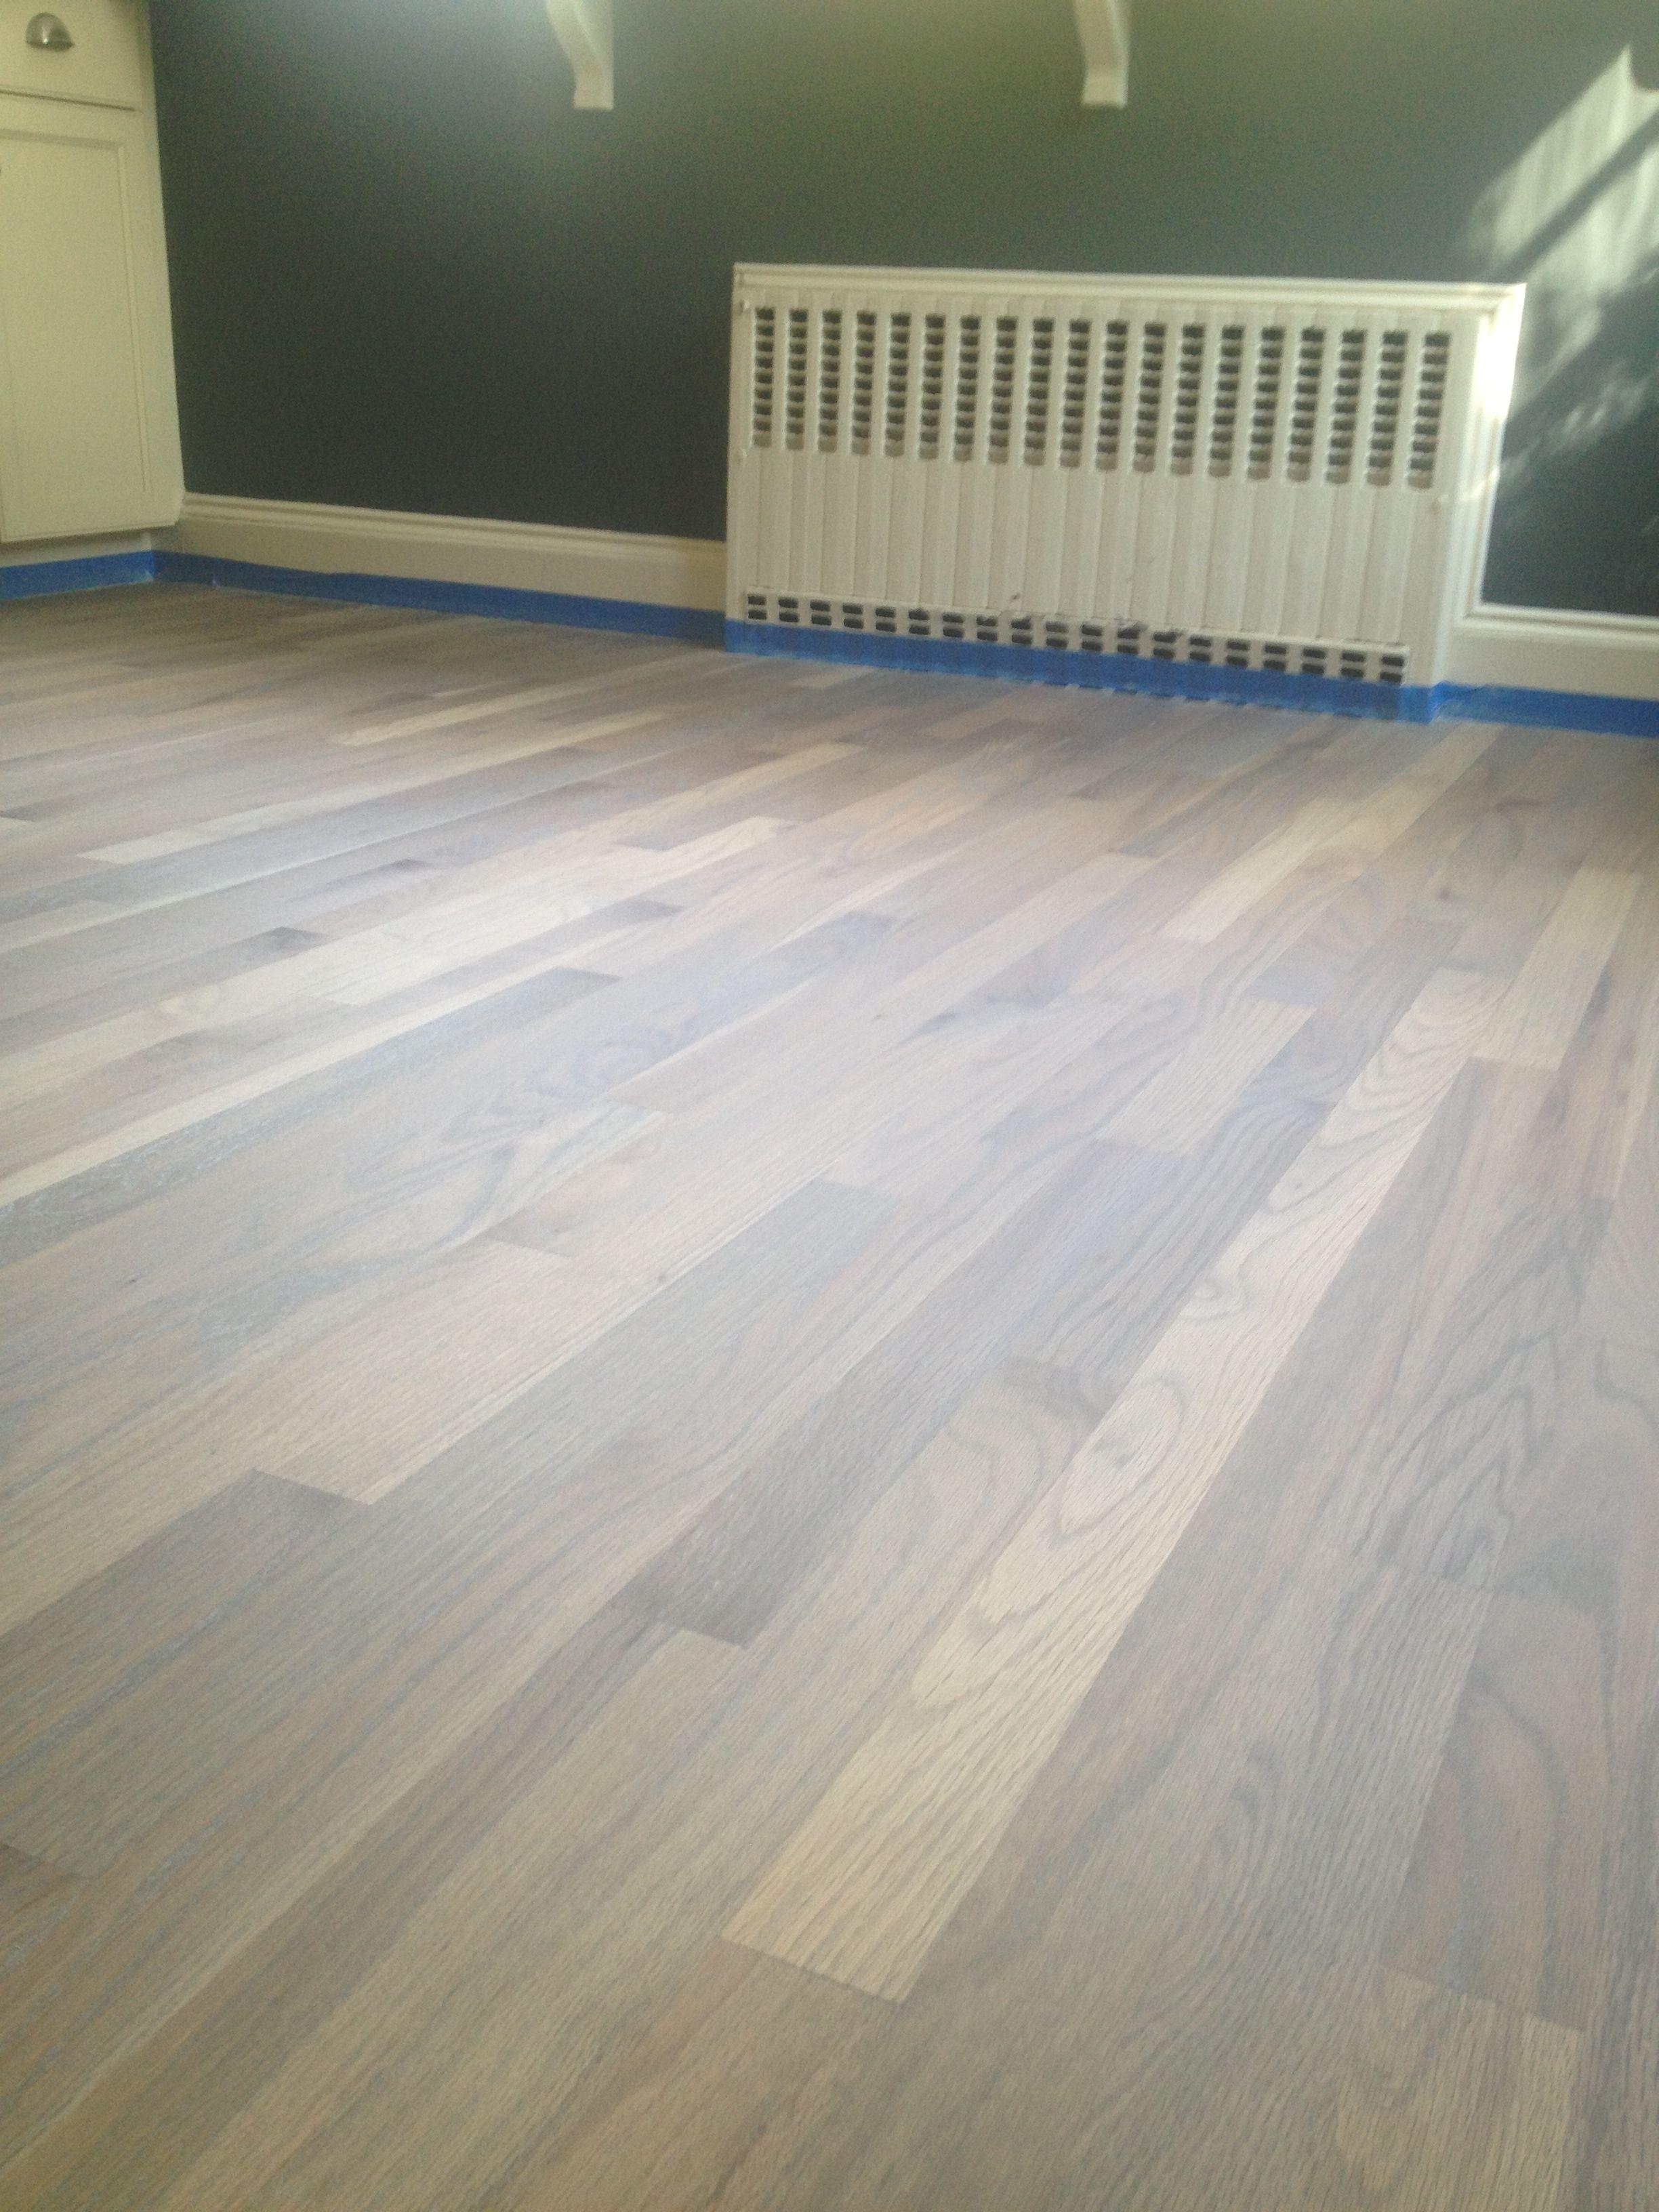 Rubio Monocoat Refinish On Red Oak Red Oak Hardwood Floors Red Oak Floors Wood Floor Stain Colors